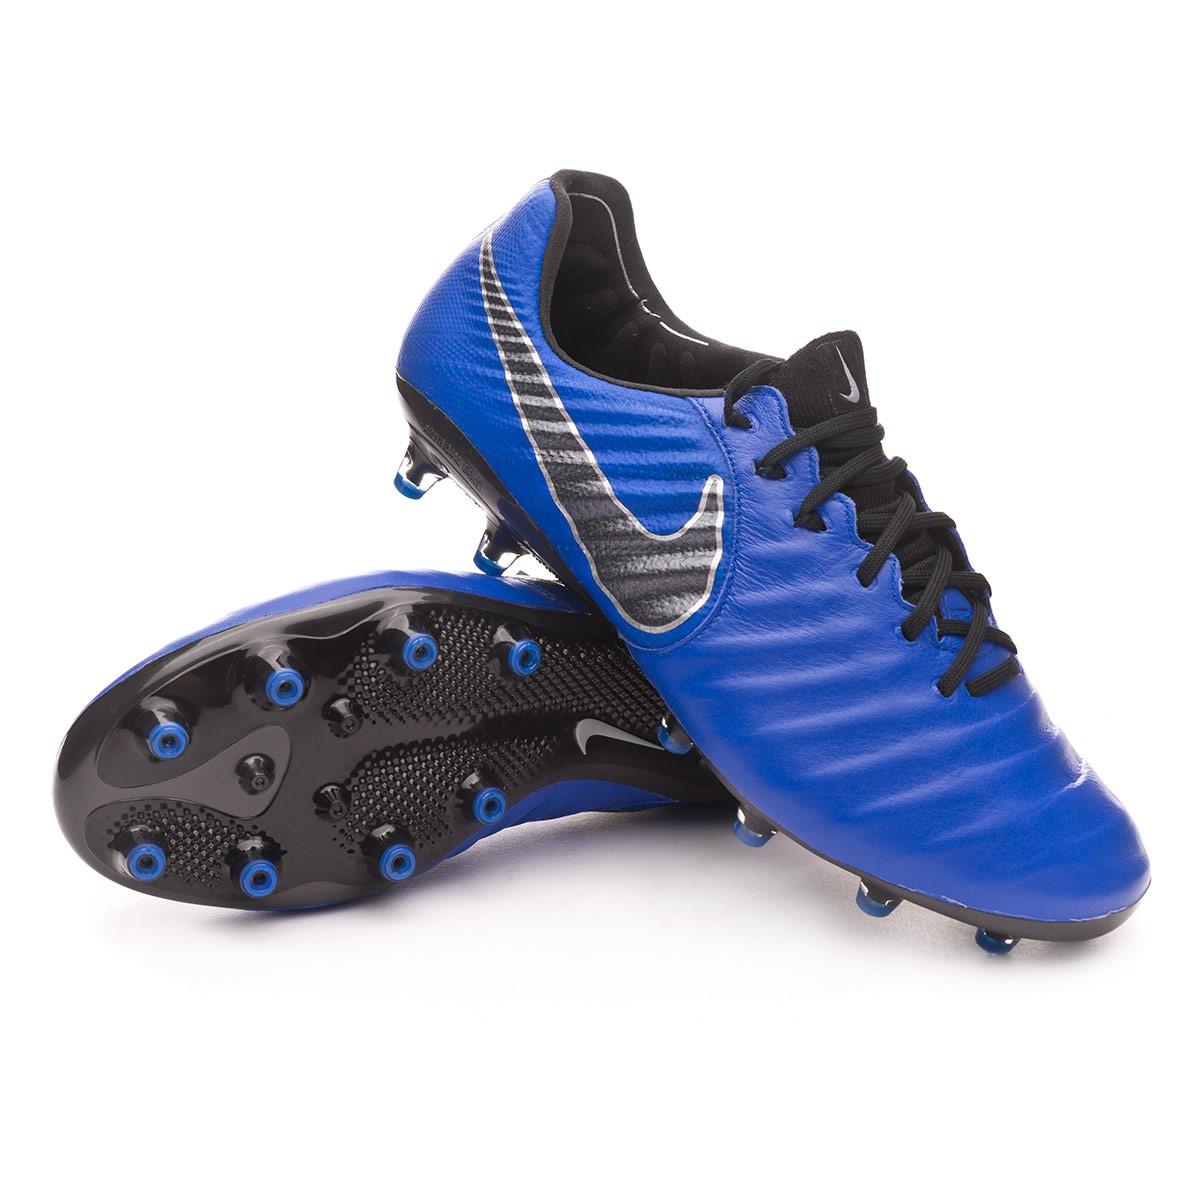 Isla de Alcatraz libro de bolsillo Senado  Football Boots Nike Tiempo Legend VII Elite AG-Pro Racer  blue-Black-Metallic silver - Football store Fútbol Emotion